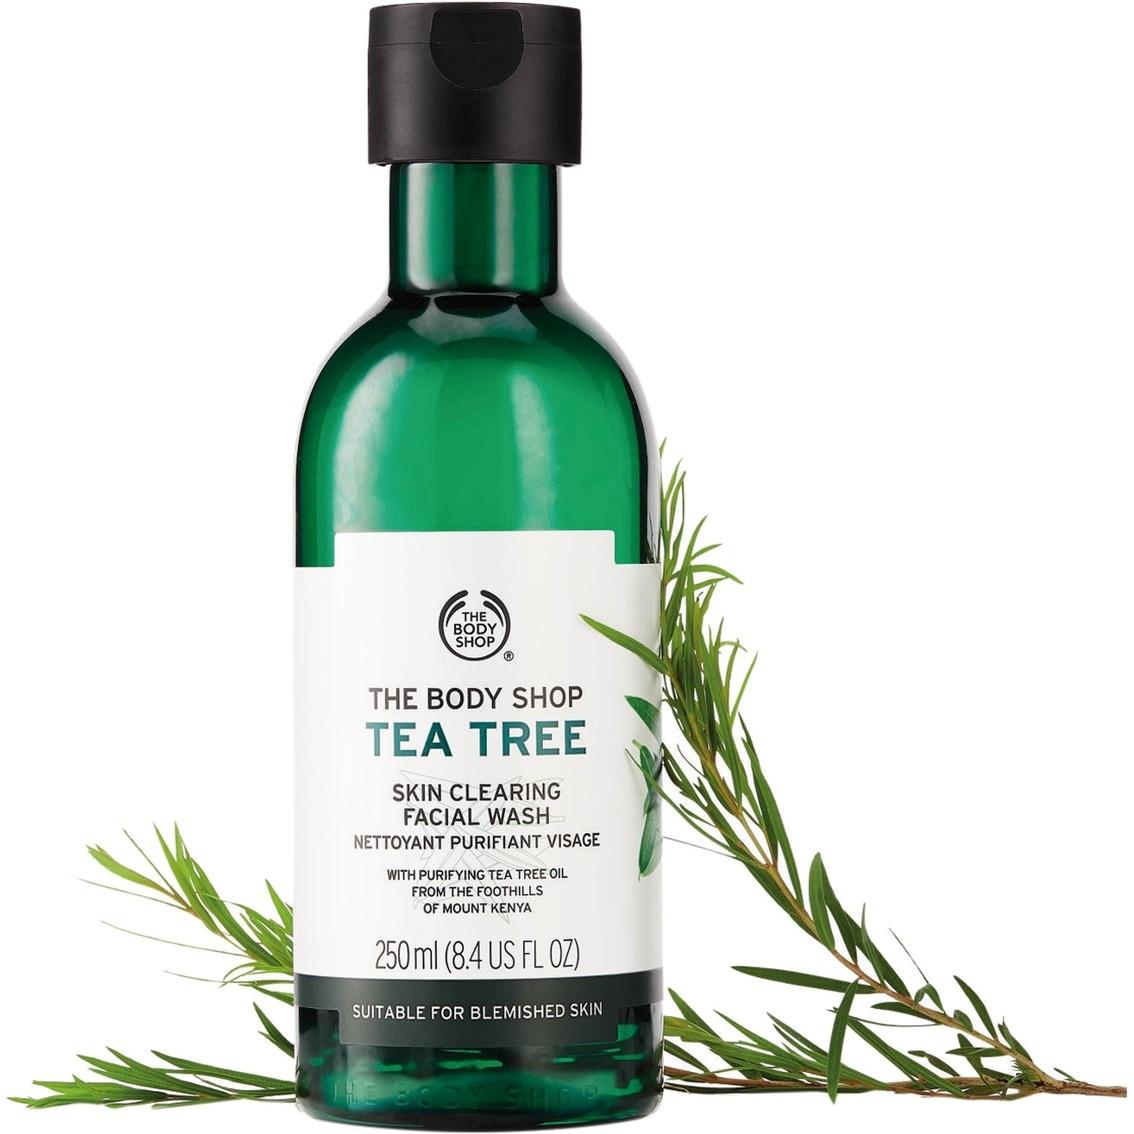 The Body Shop Tea Tree Skin Clearing Facial Wash 1